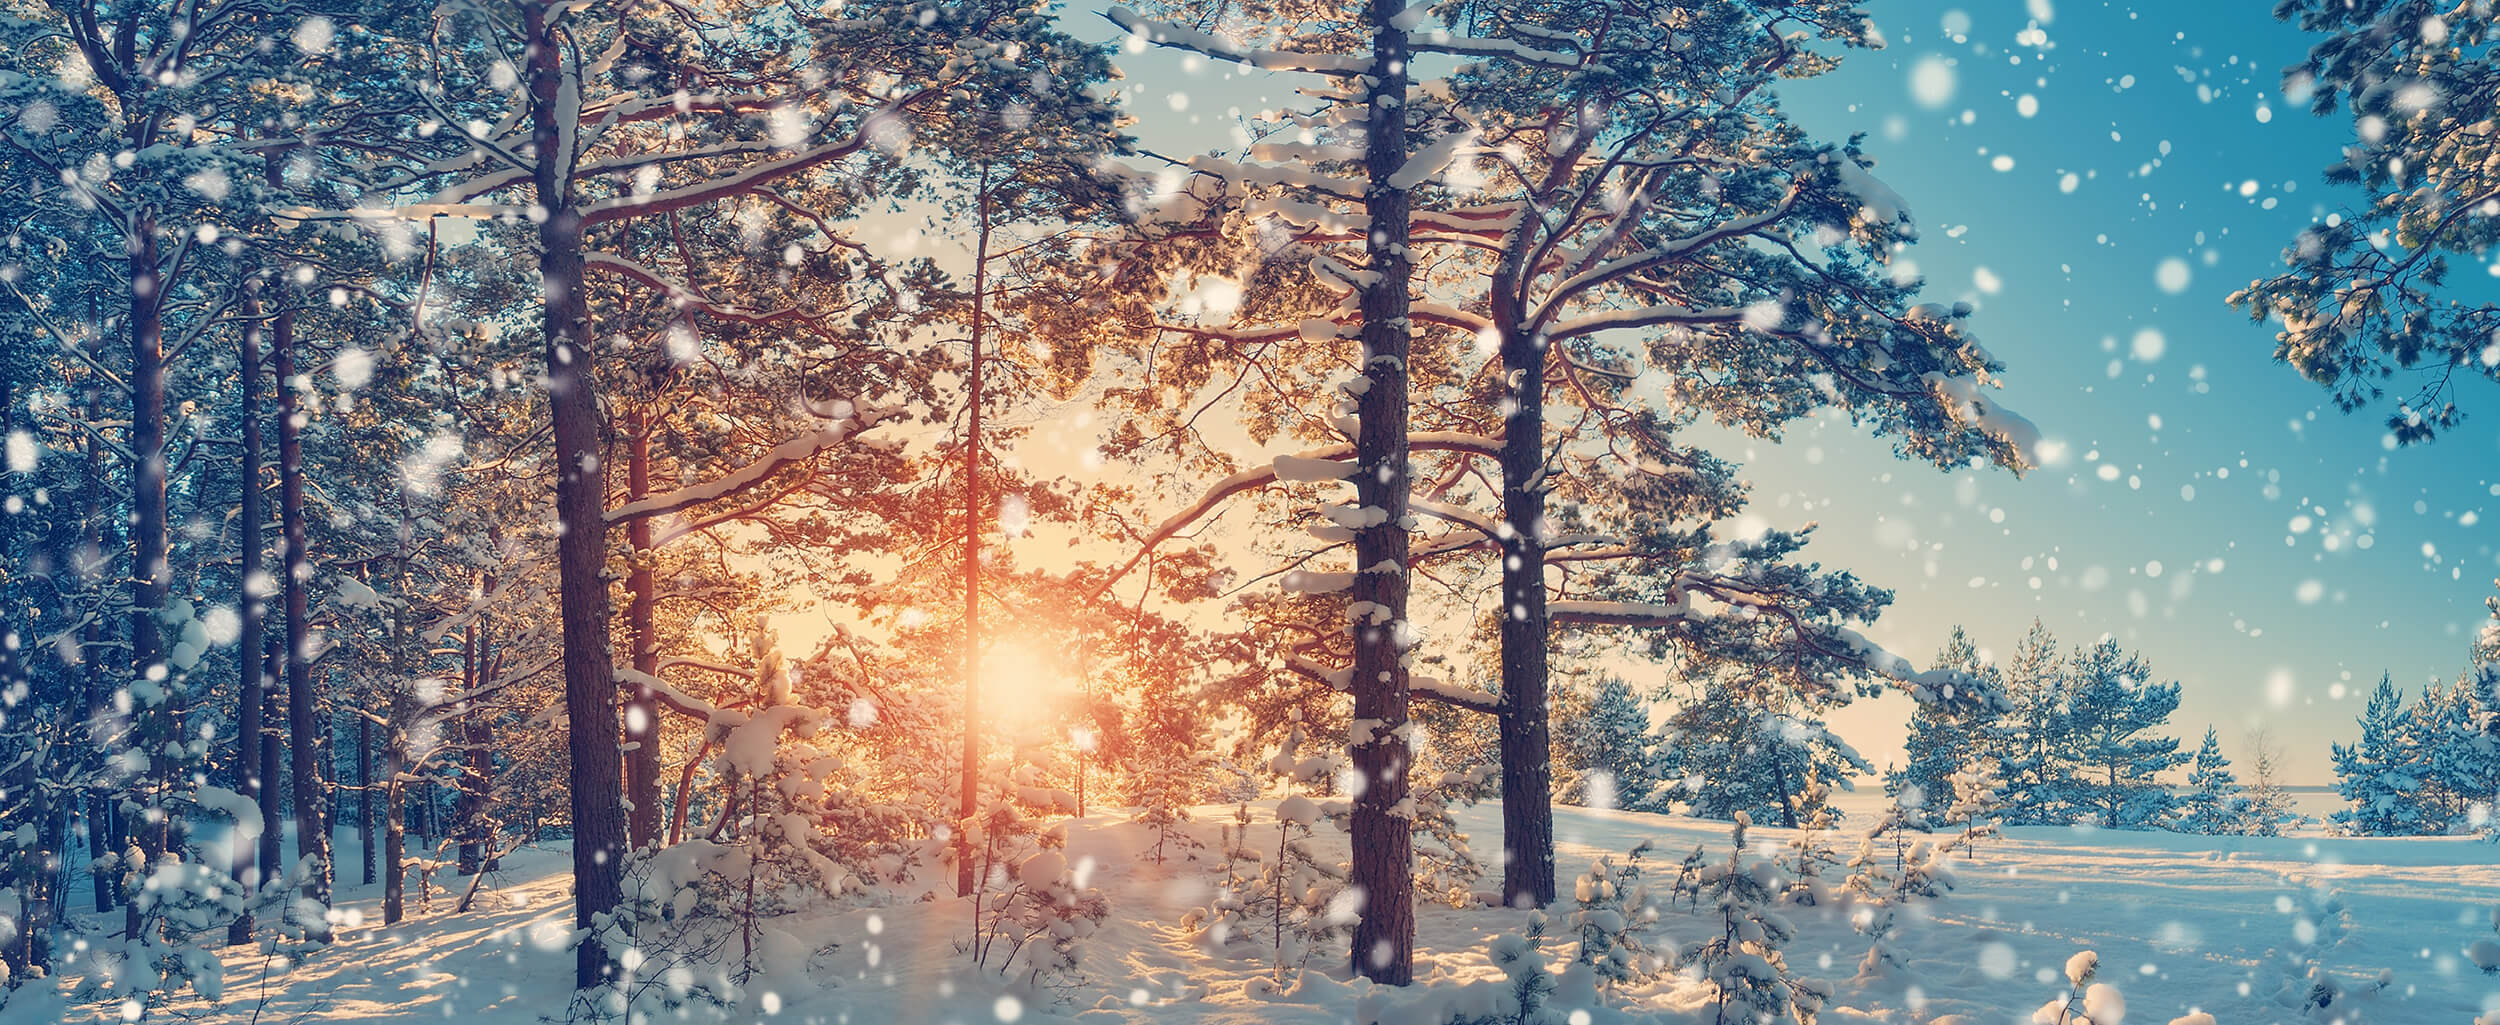 Winterdienst in Herne bis 300 Meter Fläche